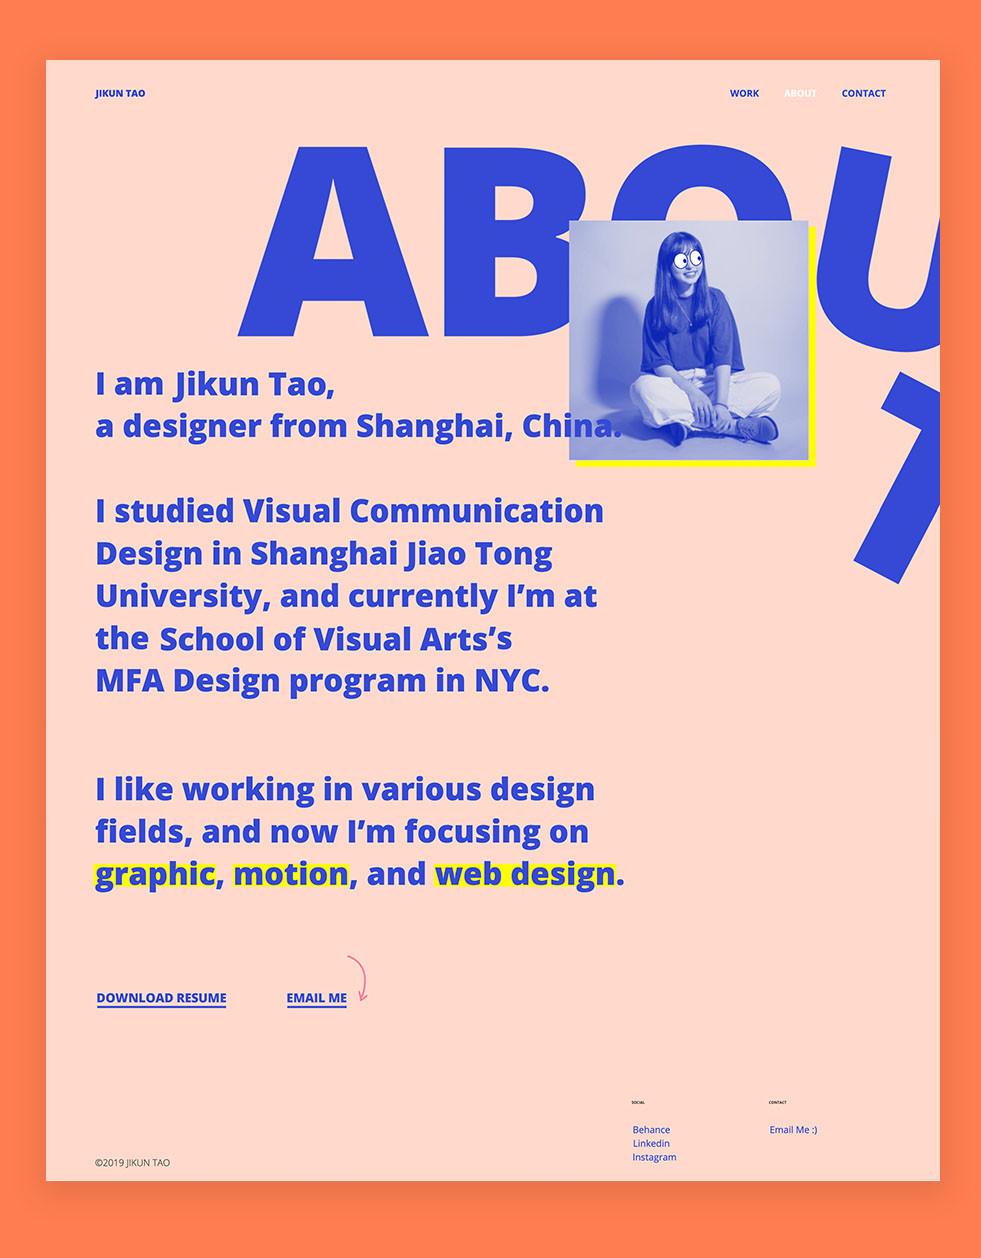 how to create an online portfolio example by Jikun Tao